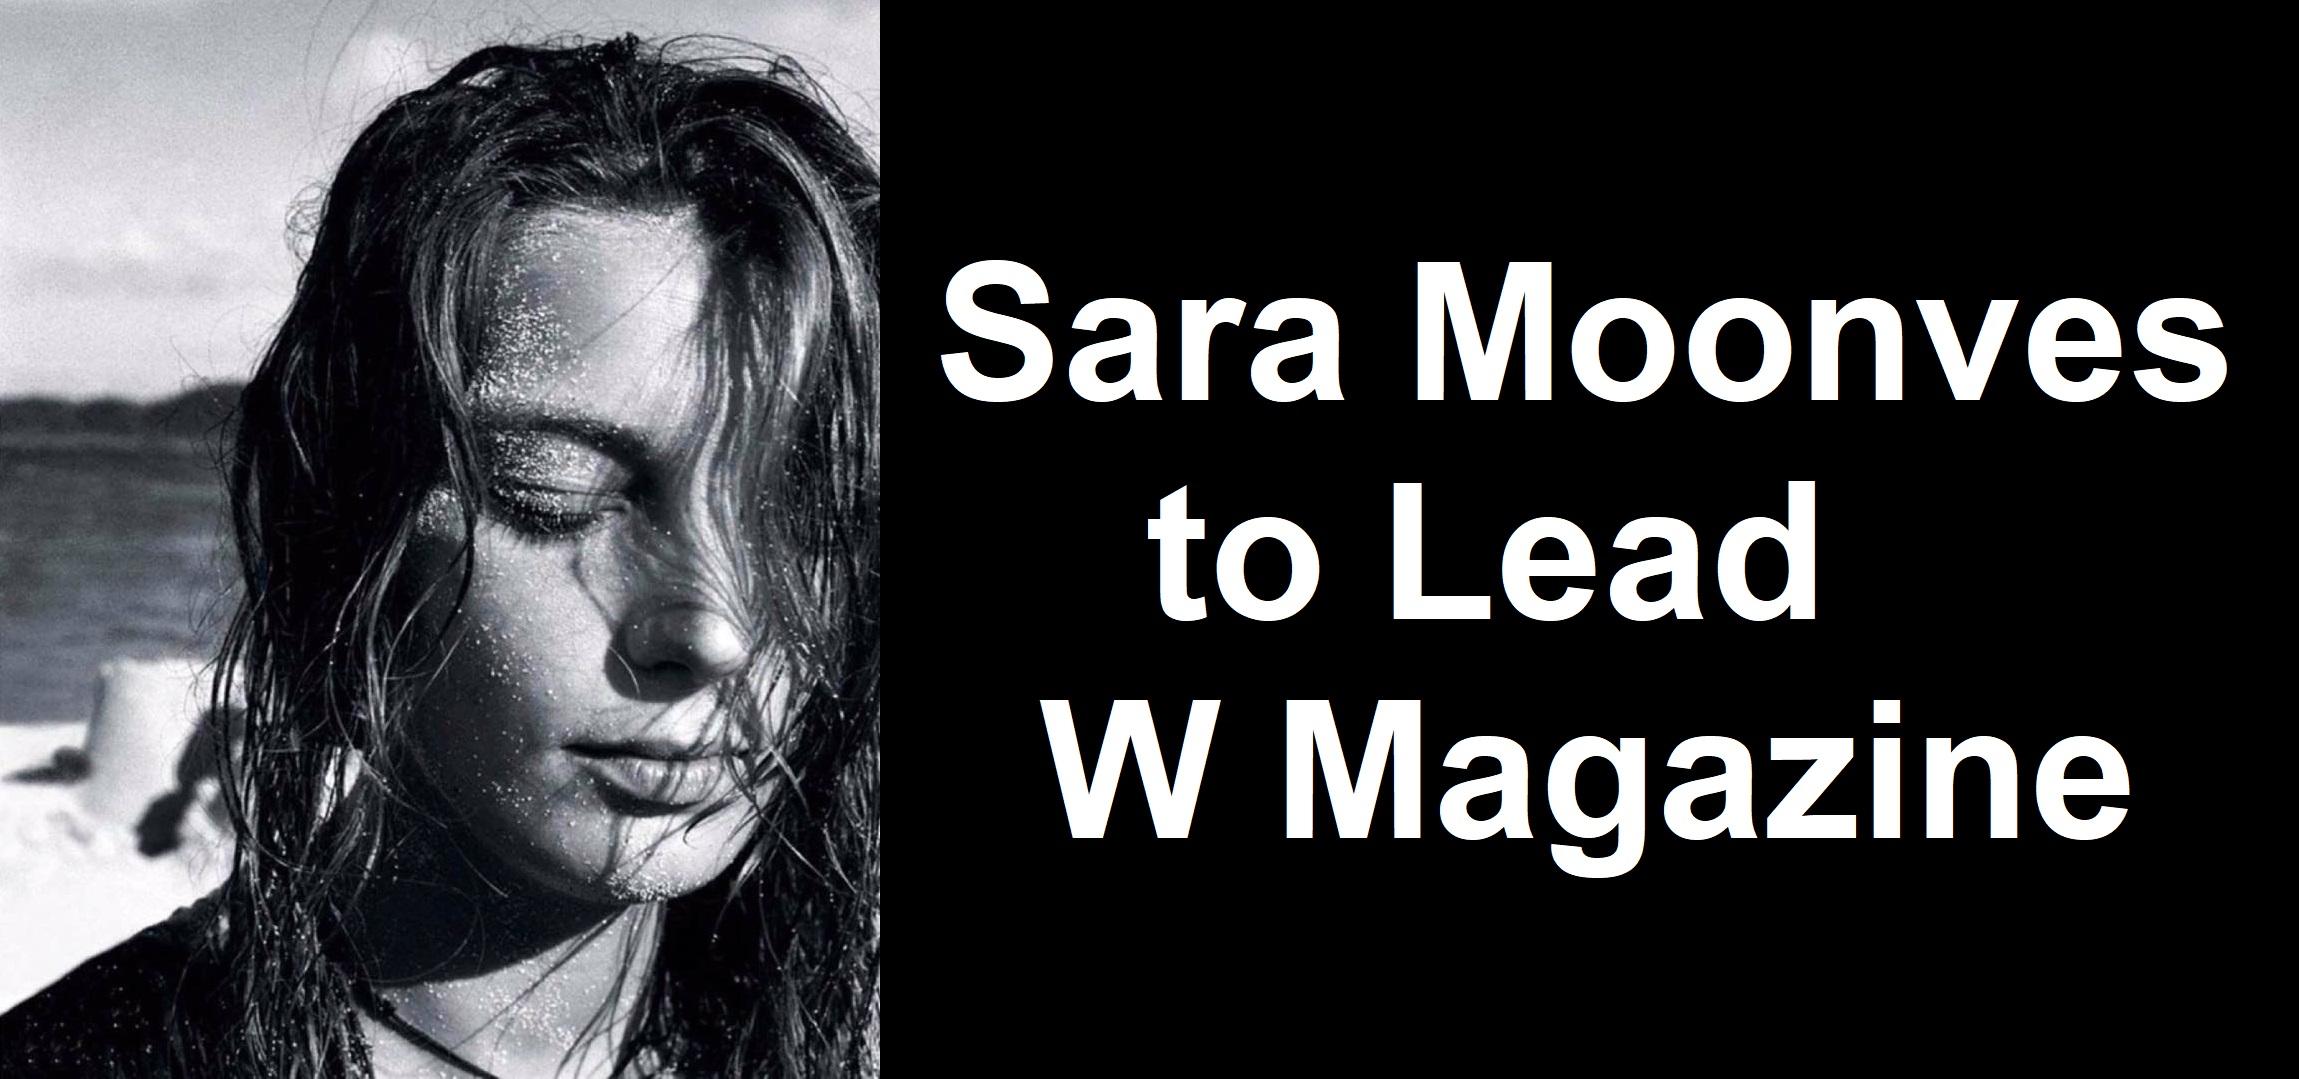 Sara Moonves W Magazine Editor.jpg